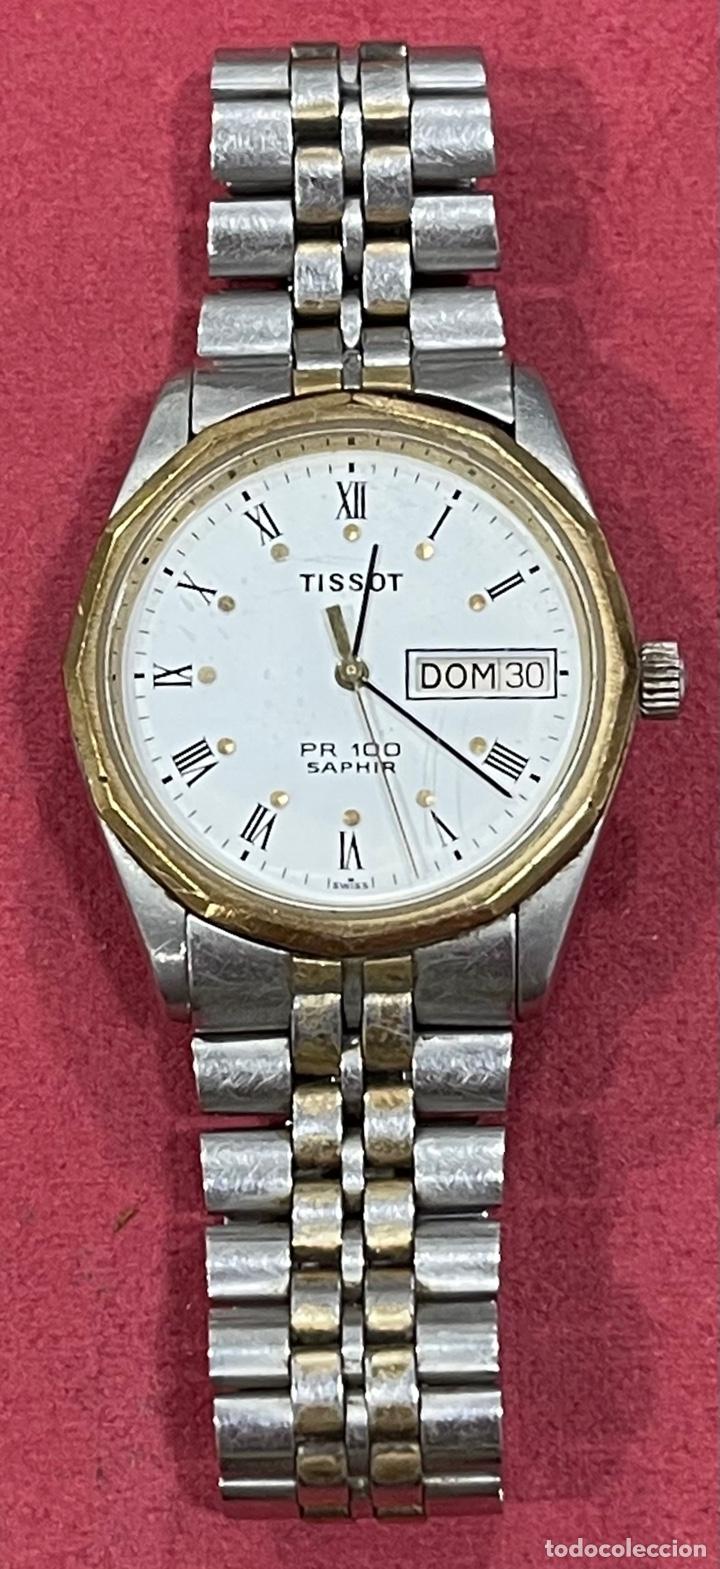 Relojes - Tissot: Reloj de pulsera, Tissot Saphir PR100. Funcionando. Armis original. - Foto 3 - 266371313